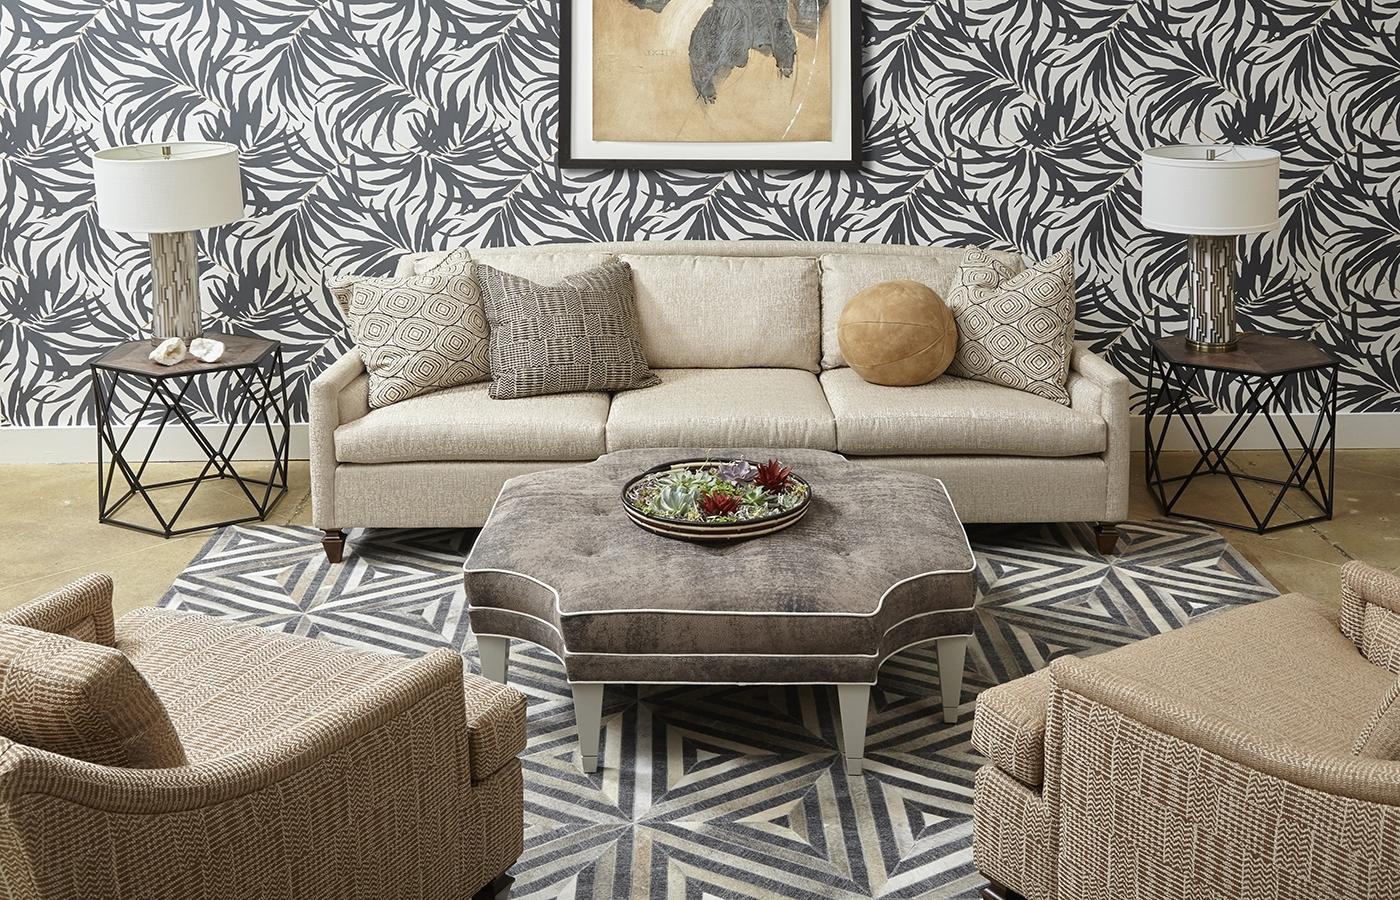 Most Recent Norwalk Furniture In Norwalk Sofas (View 7 of 15)